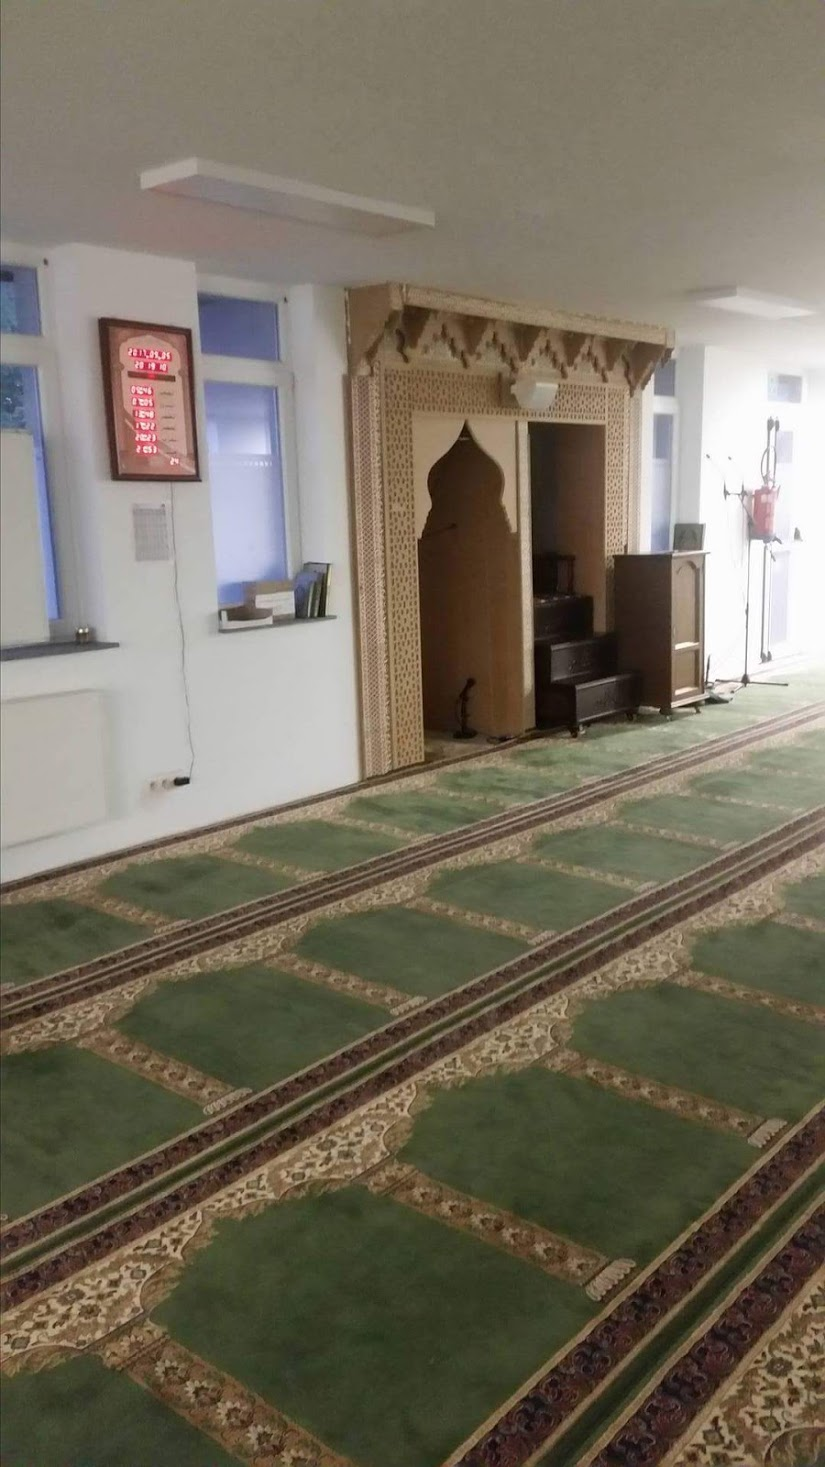 Mosquée Al Fath, Mons, Belgium